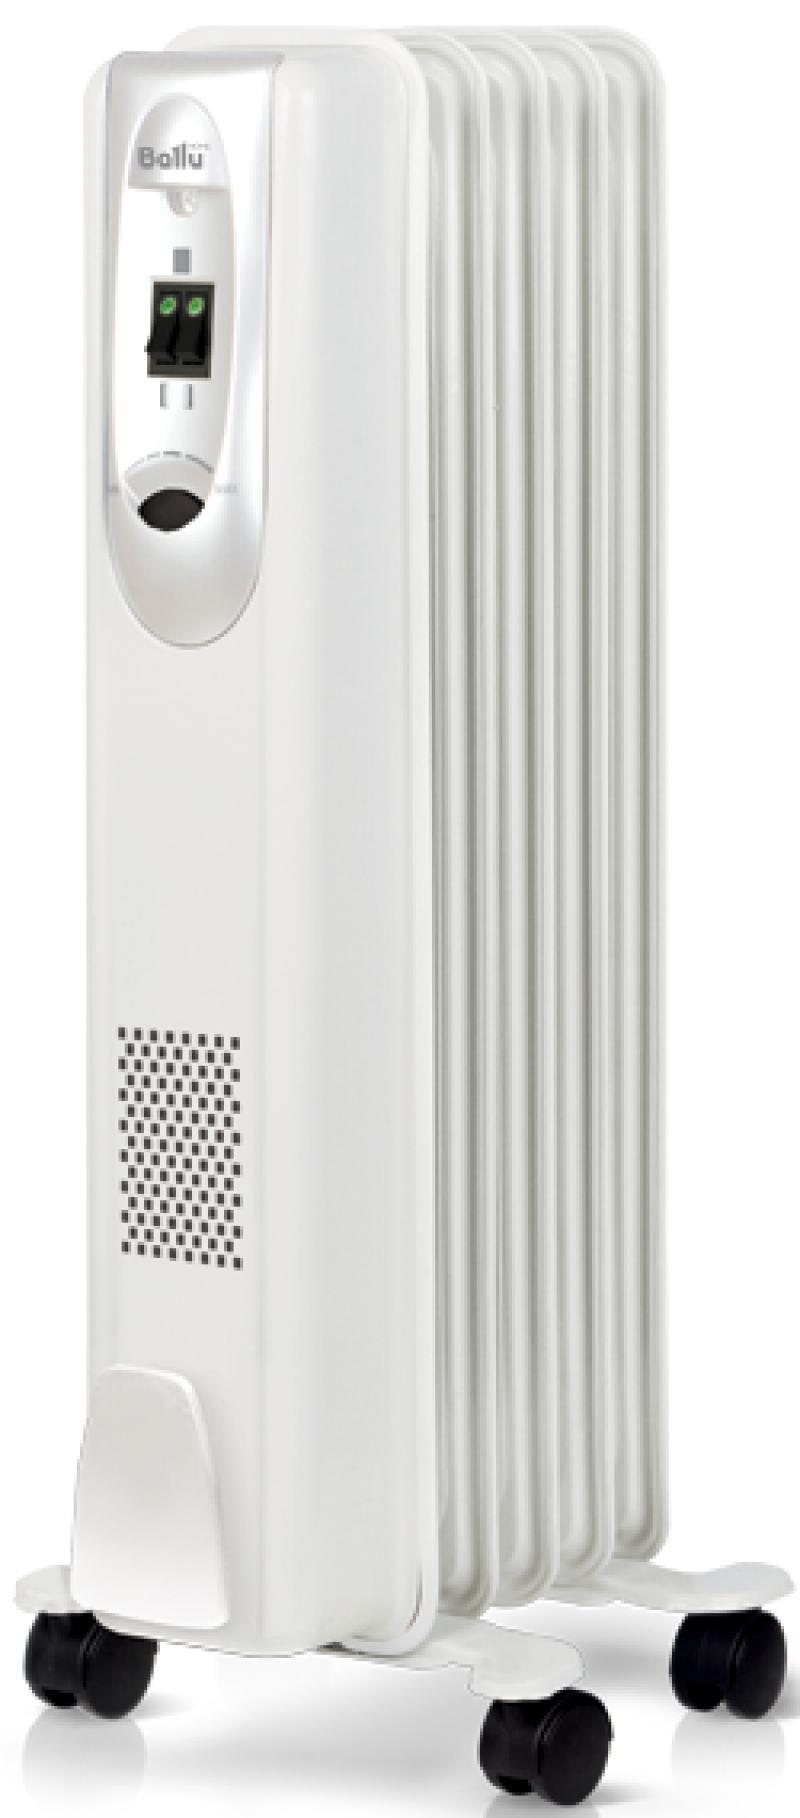 Масляный радиатор BALLU Comfort BOH/CM-05WDN 1000 Вт белый масляный радиатор ballu comfort boh cm 07wd